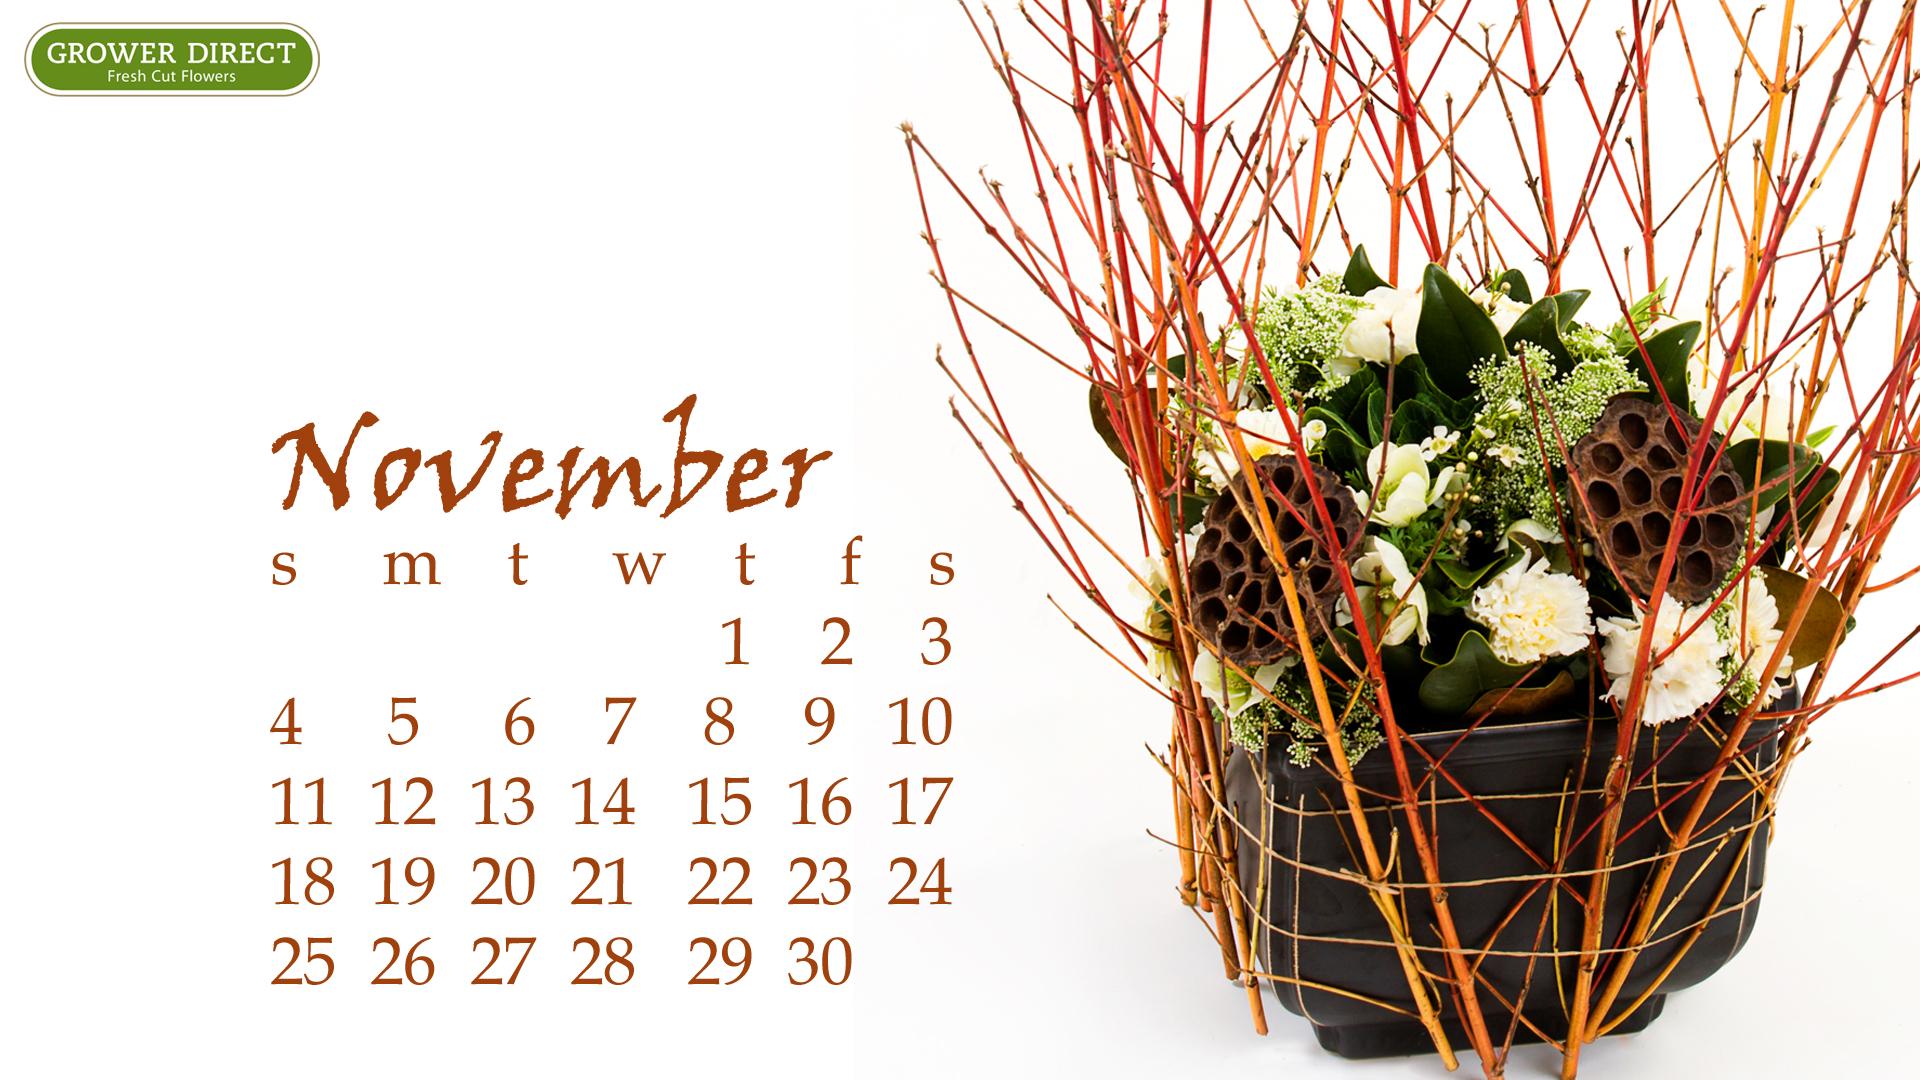 freebie friday  free hd november 2012 desktop calendar wallpapers